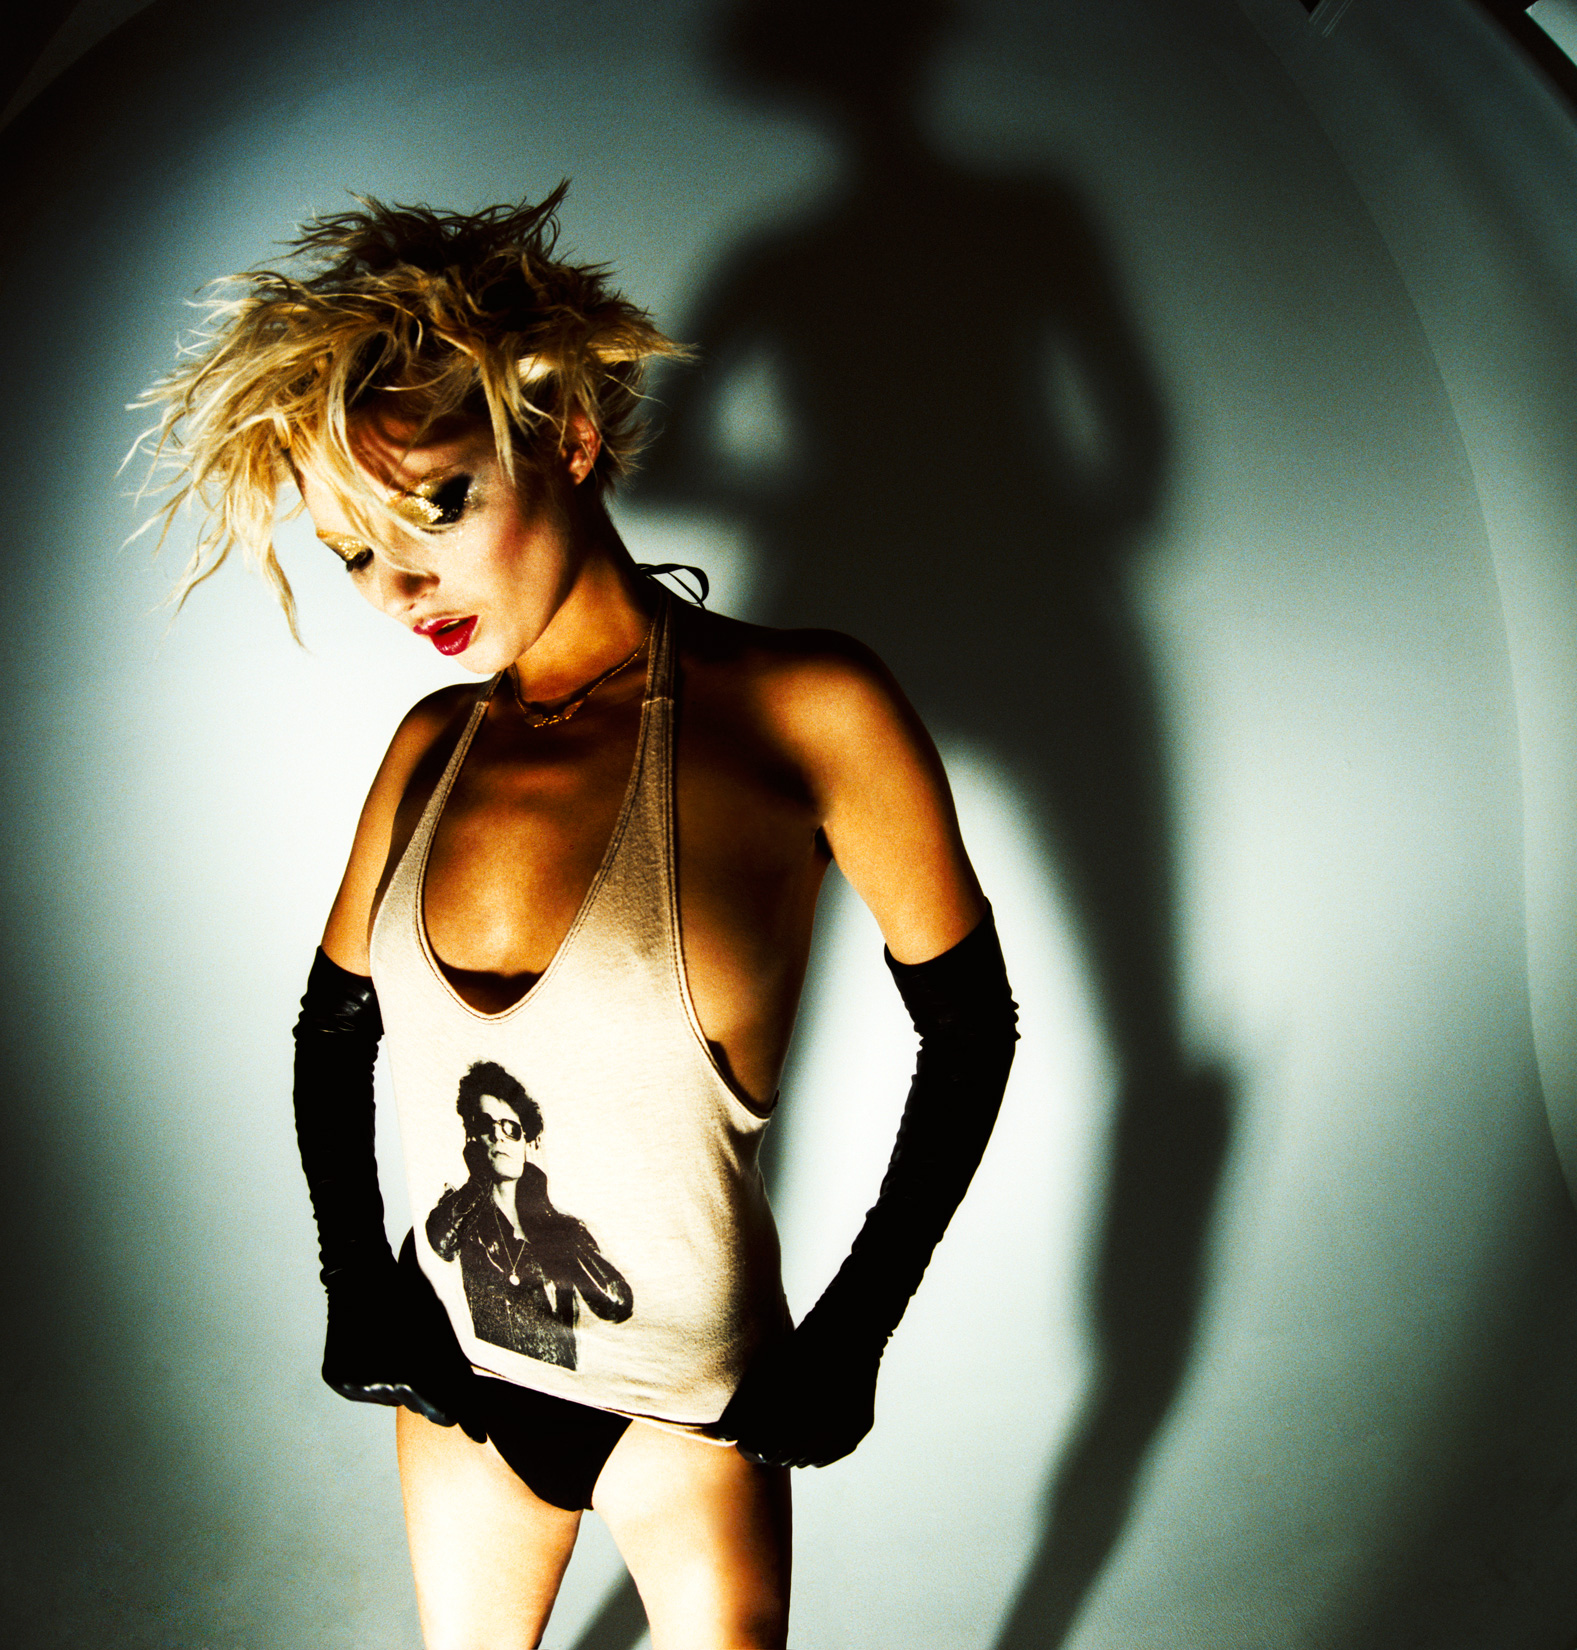 Kat Moss, Lou Reed tee, New York, USA, 2002, © Mick Rock / courtesy The Print Room